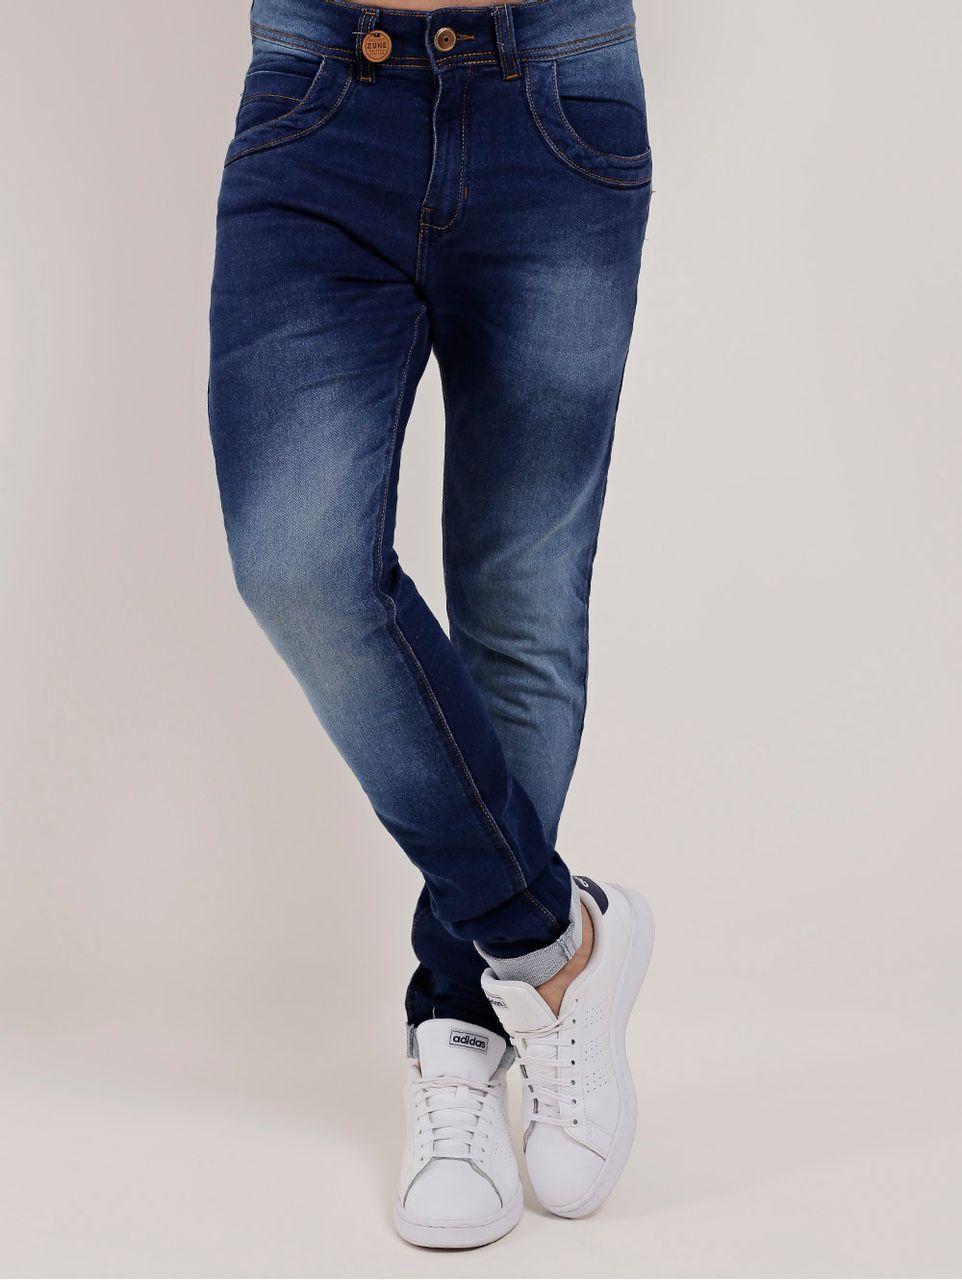 Calça Jeans Moletom Masculina Zune Azul